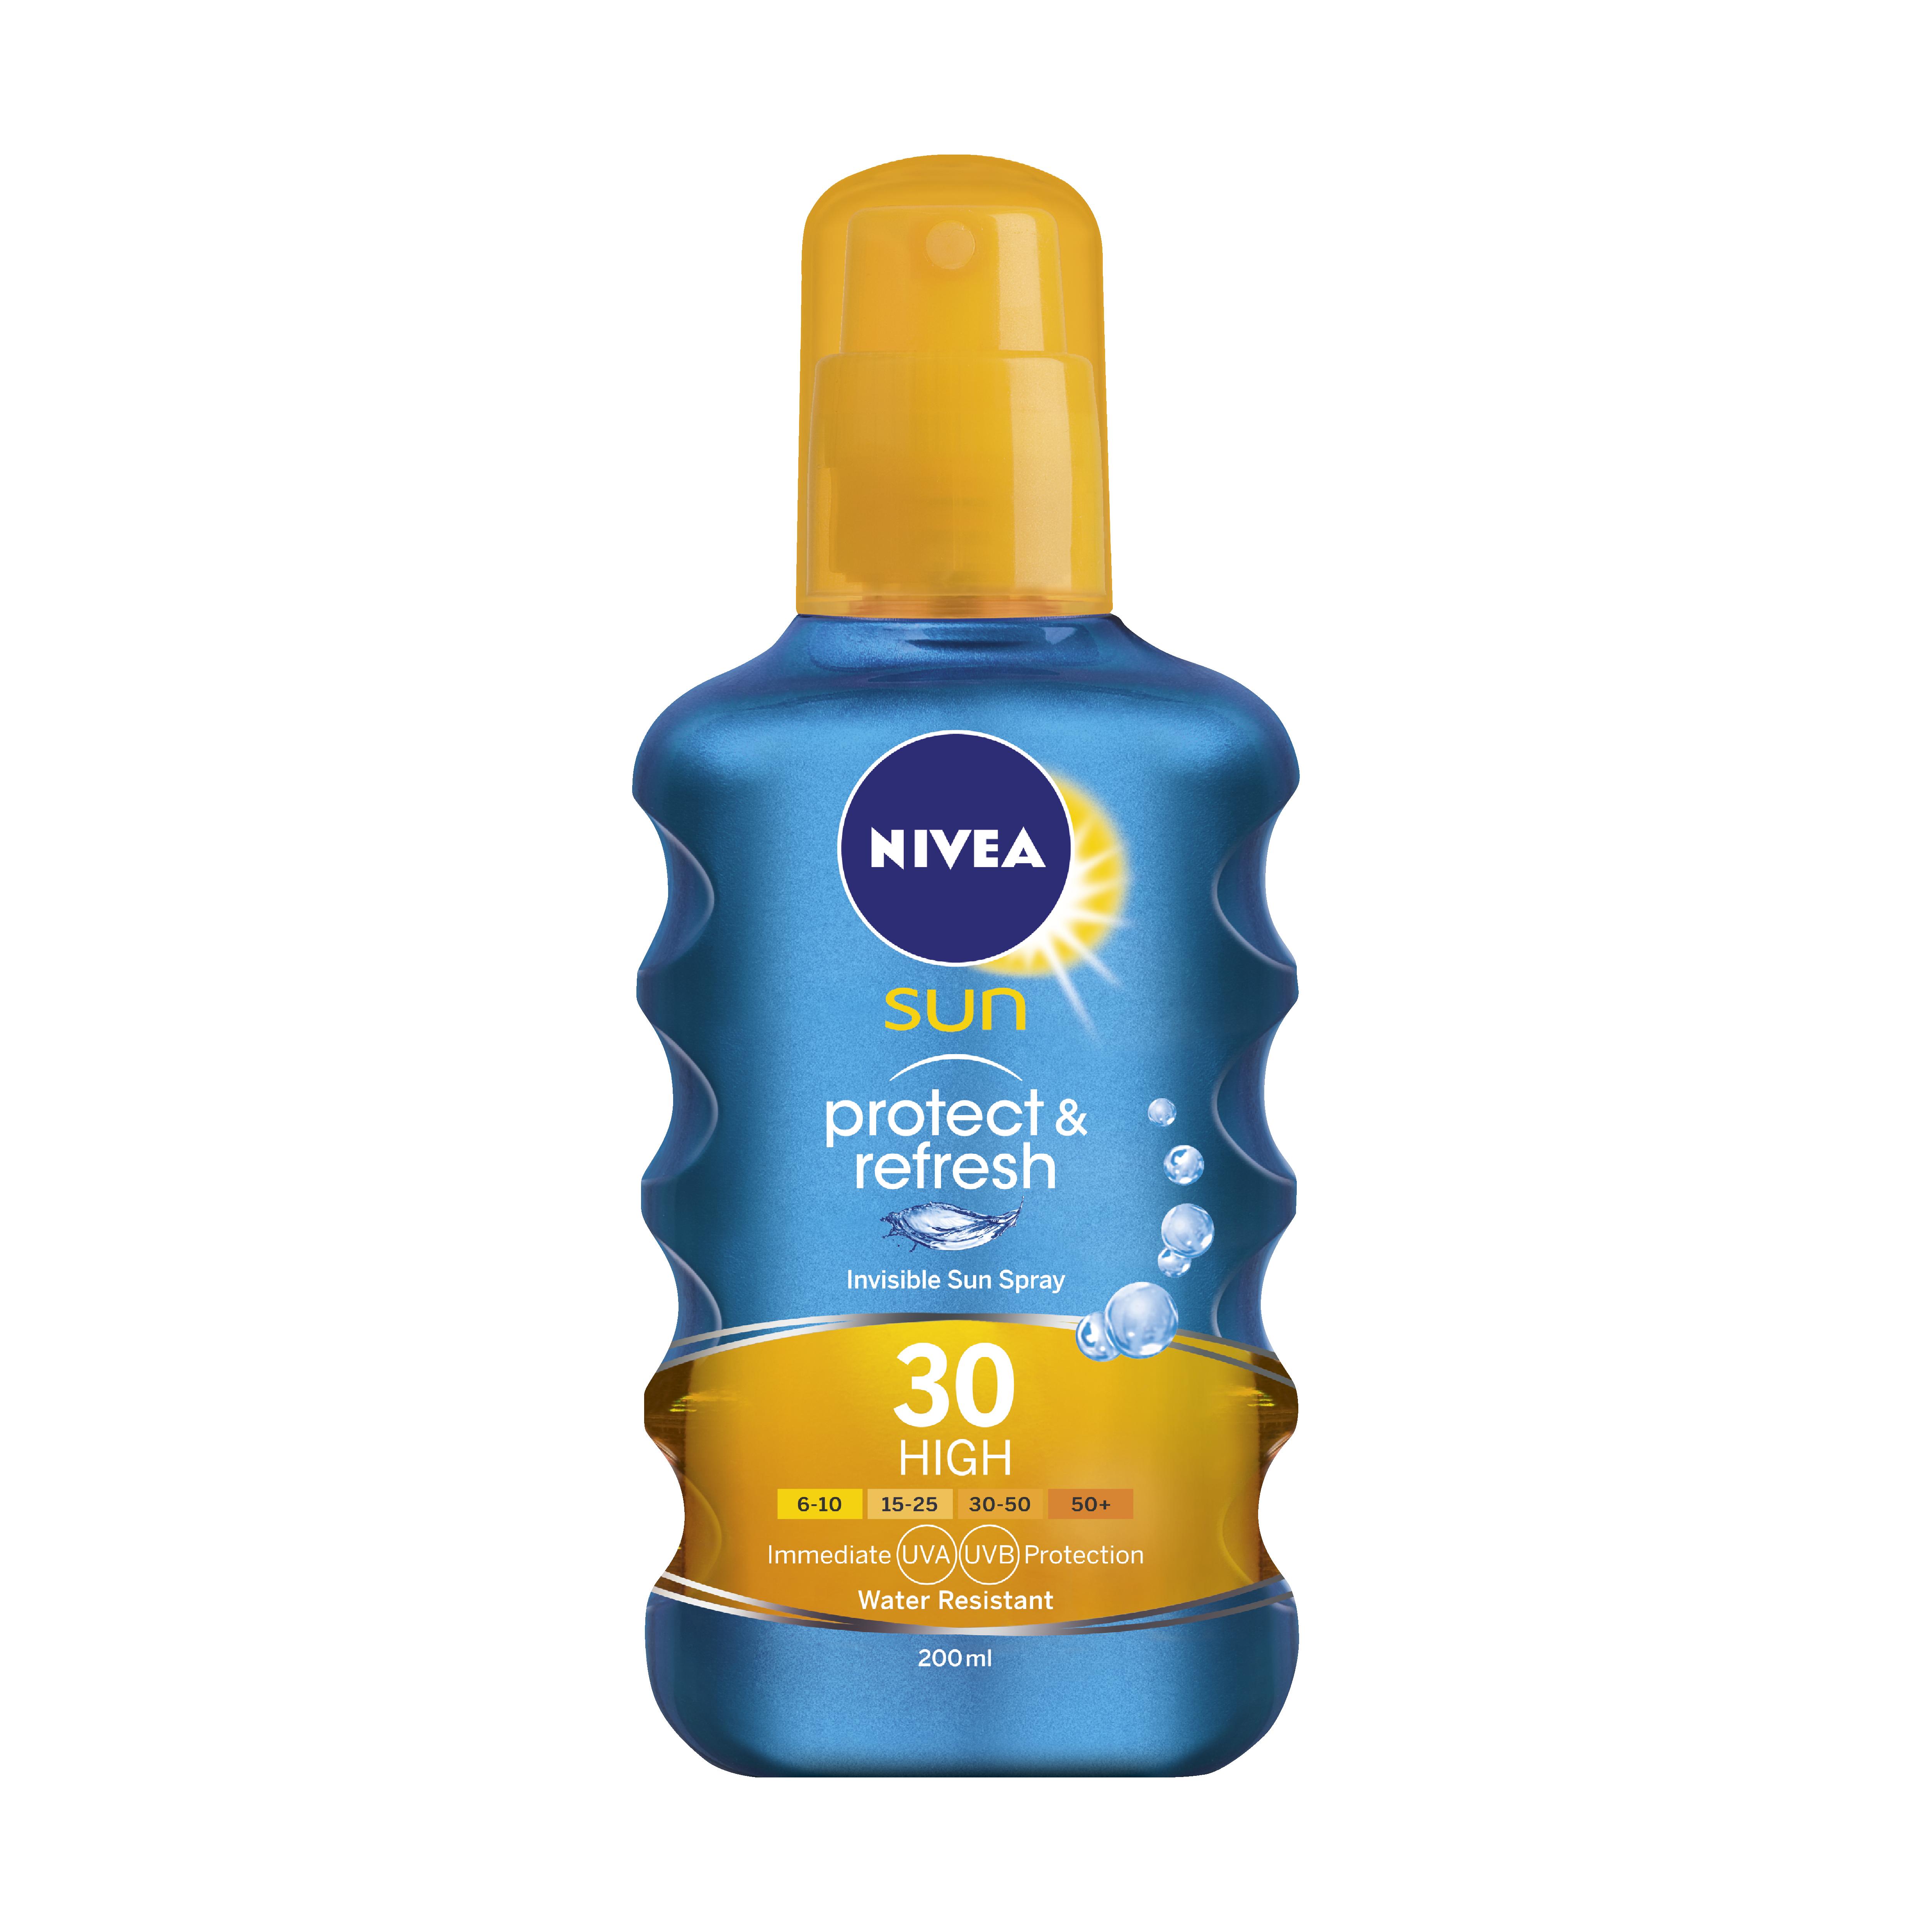 Protect & Refresh Invisible Spray SPF 30